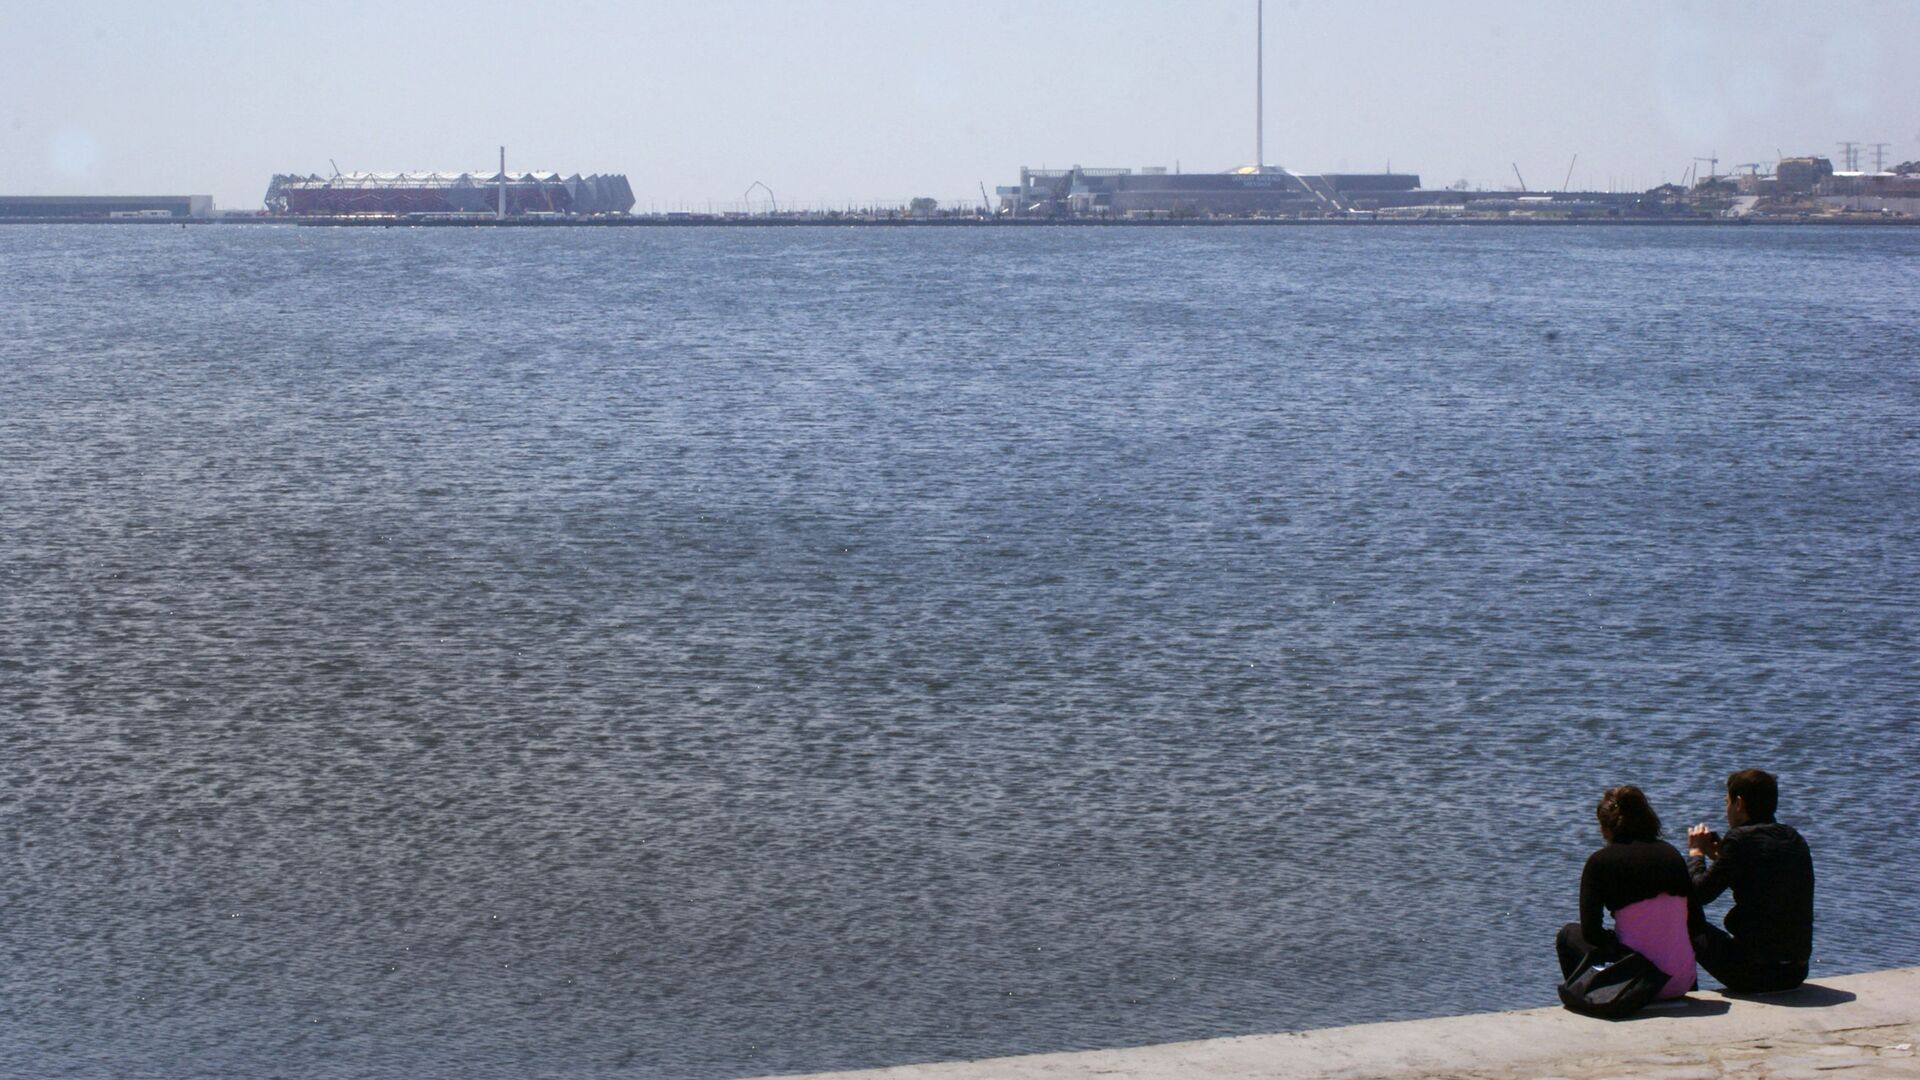 Вид на Каспийское море с бакинского бульвара, фото из архива - Sputnik Azərbaycan, 1920, 09.08.2021